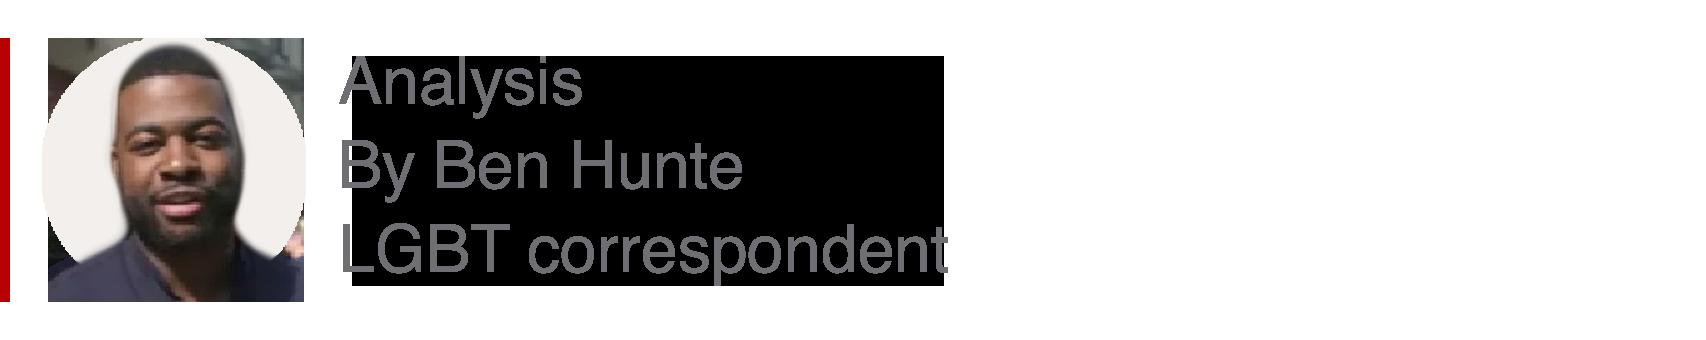 Analysis box by Ben Hunte, LGBT correspondent